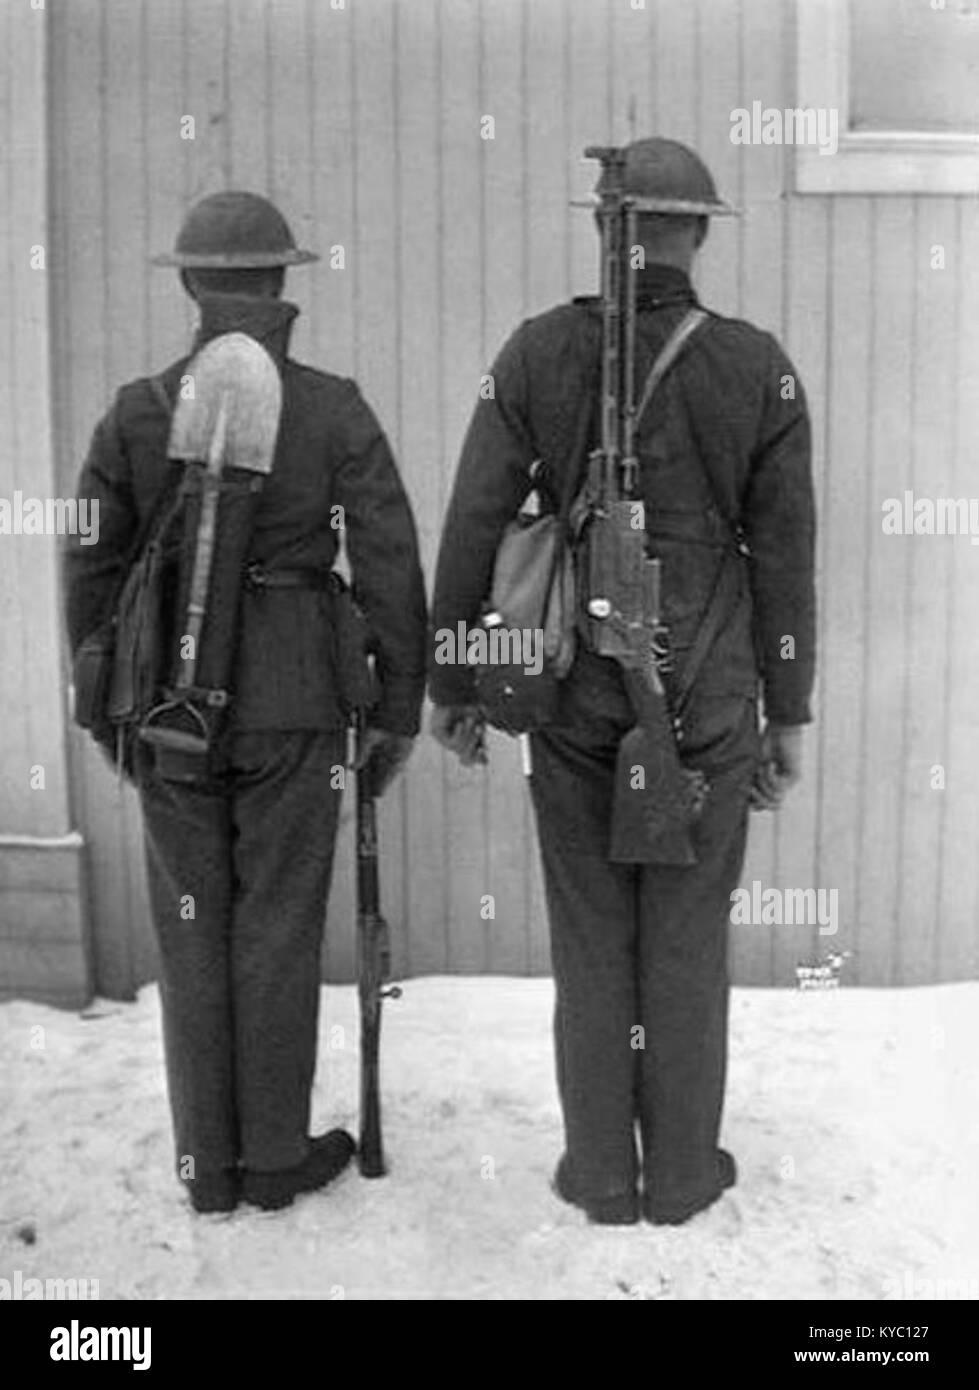 Norwegian soldiers with Krag-Jørgensen rifle and Madsen LMG - Stock Image